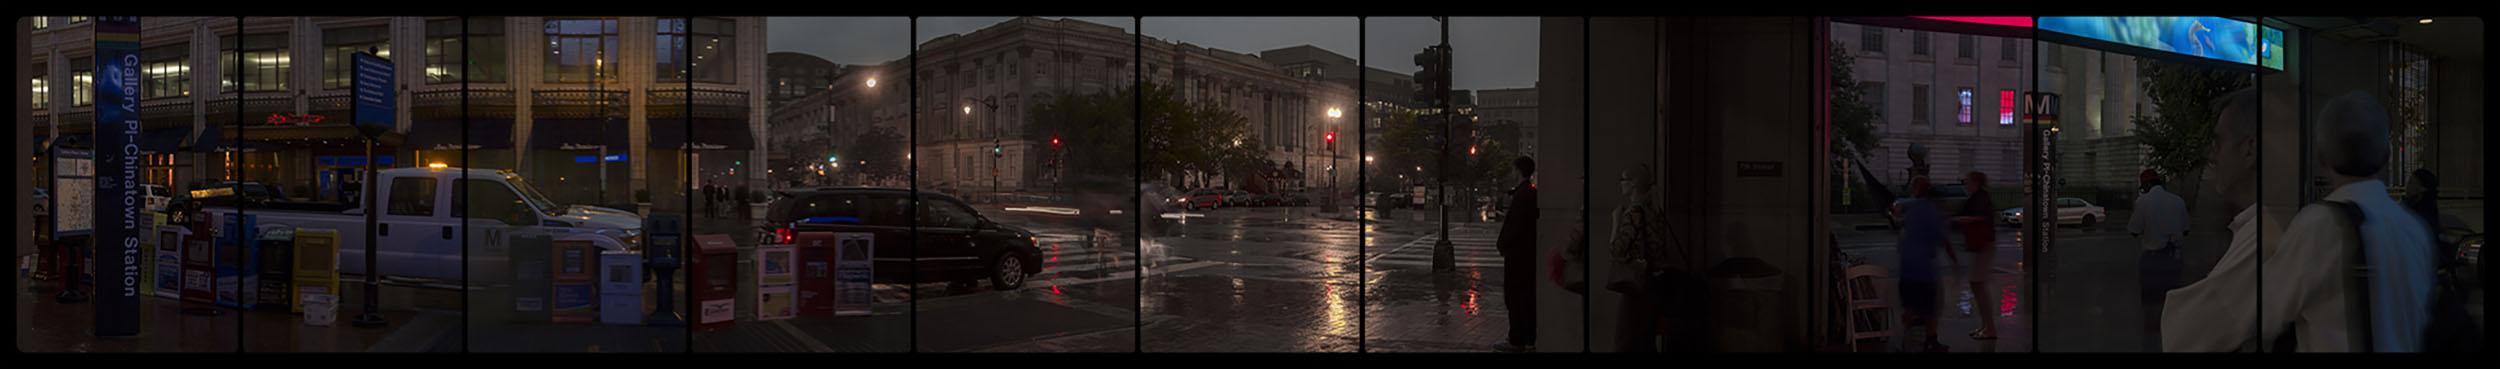 Metro Rail, Gallery Place-Chinatown, 5-27-2014-0383-0393